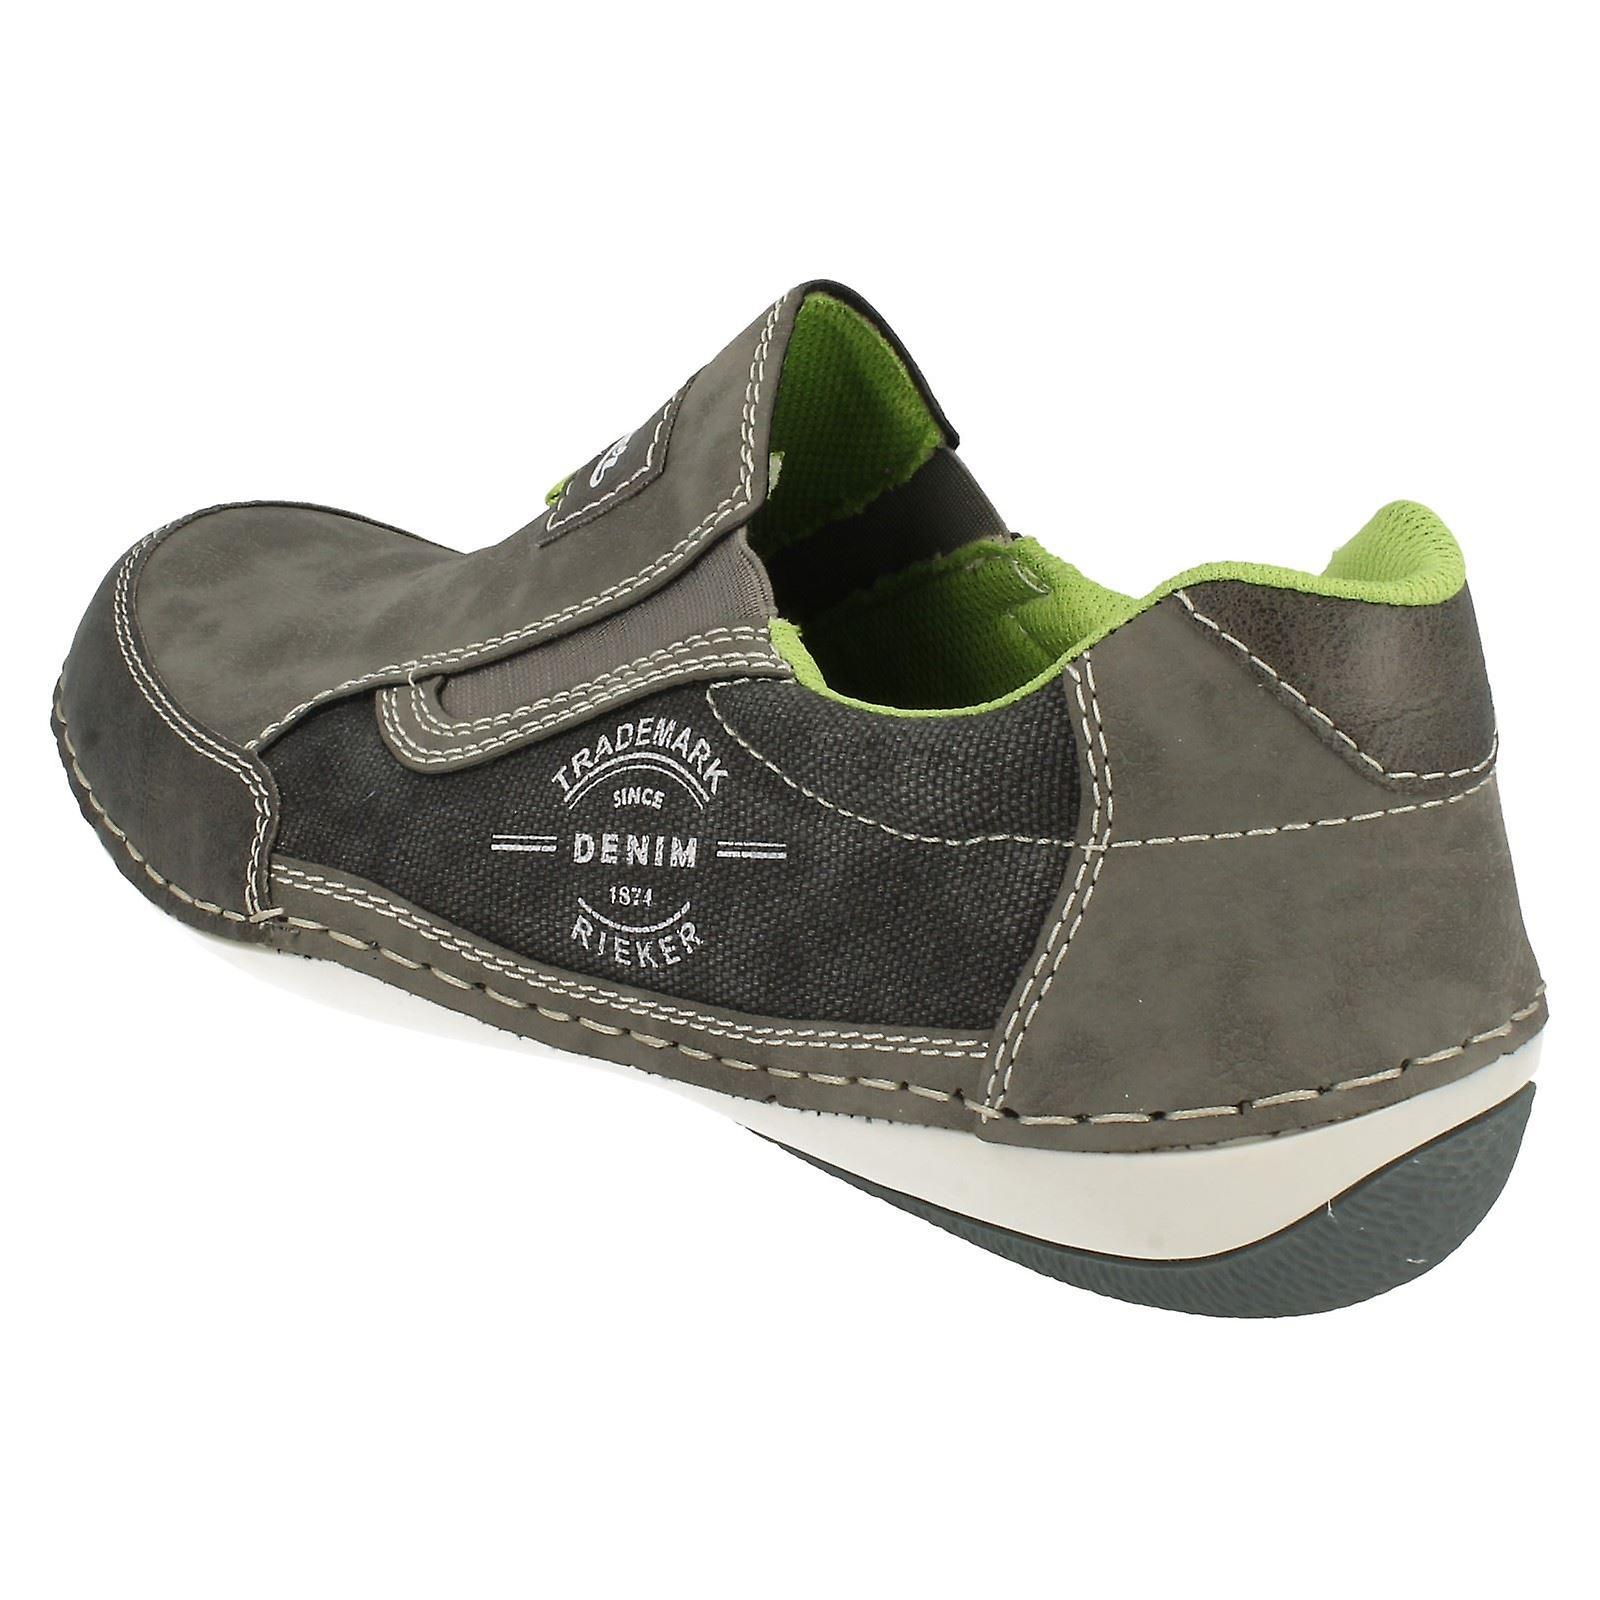 Casual Rieker Mens Casual Shoes Casual Rieker Mens B9251 Shoes Rieker B9251 Mens qIp5xxUA